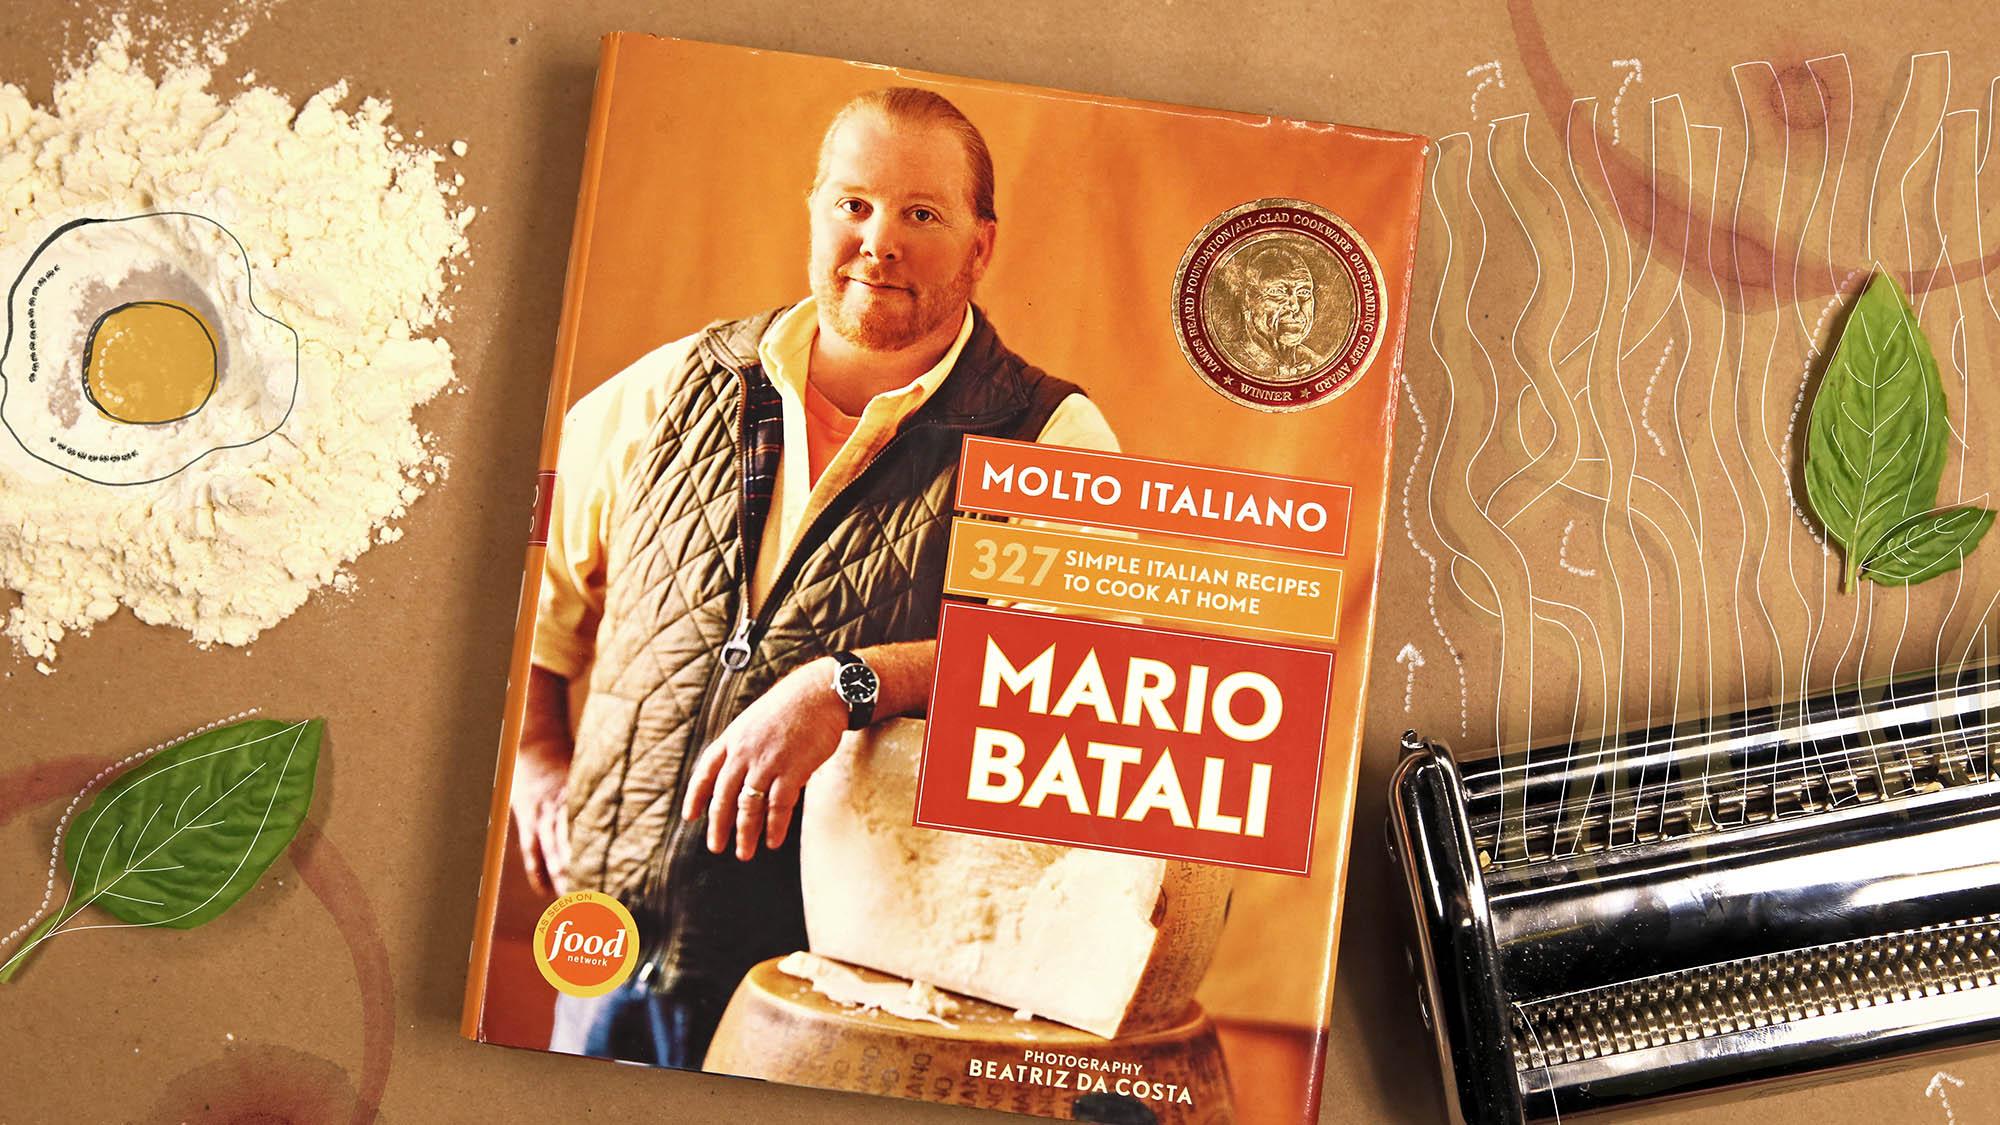 4-Mario Batali.jpg